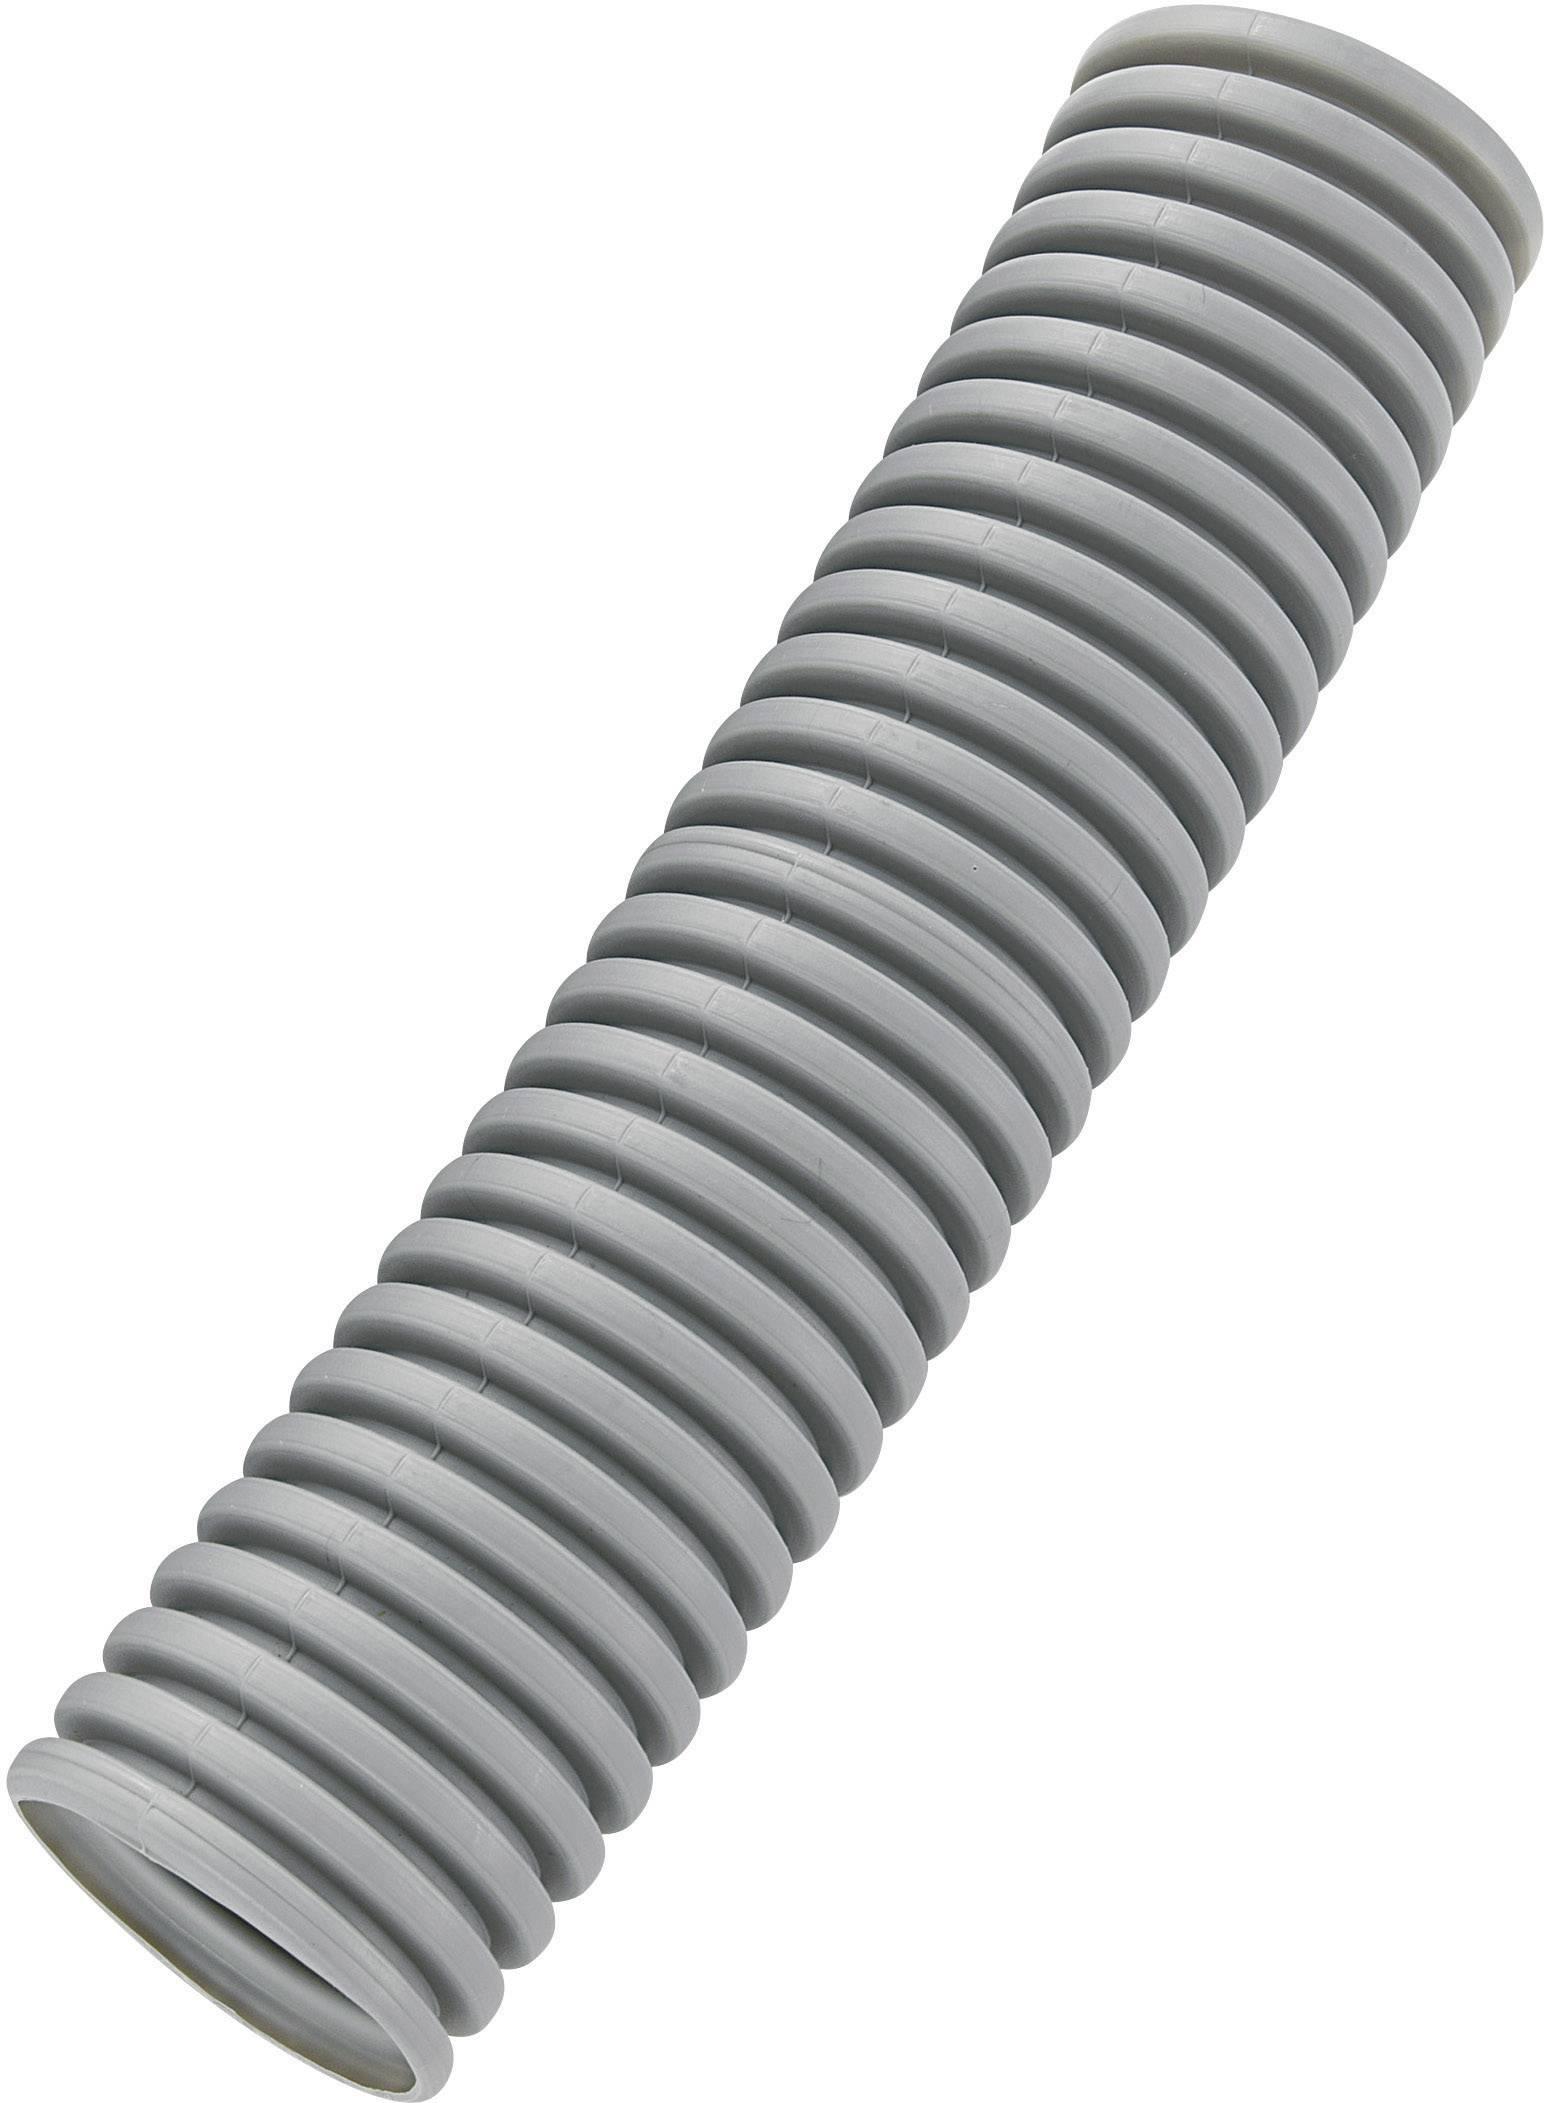 Husí krk KSS BGR10P, 10,2 mm, šedá